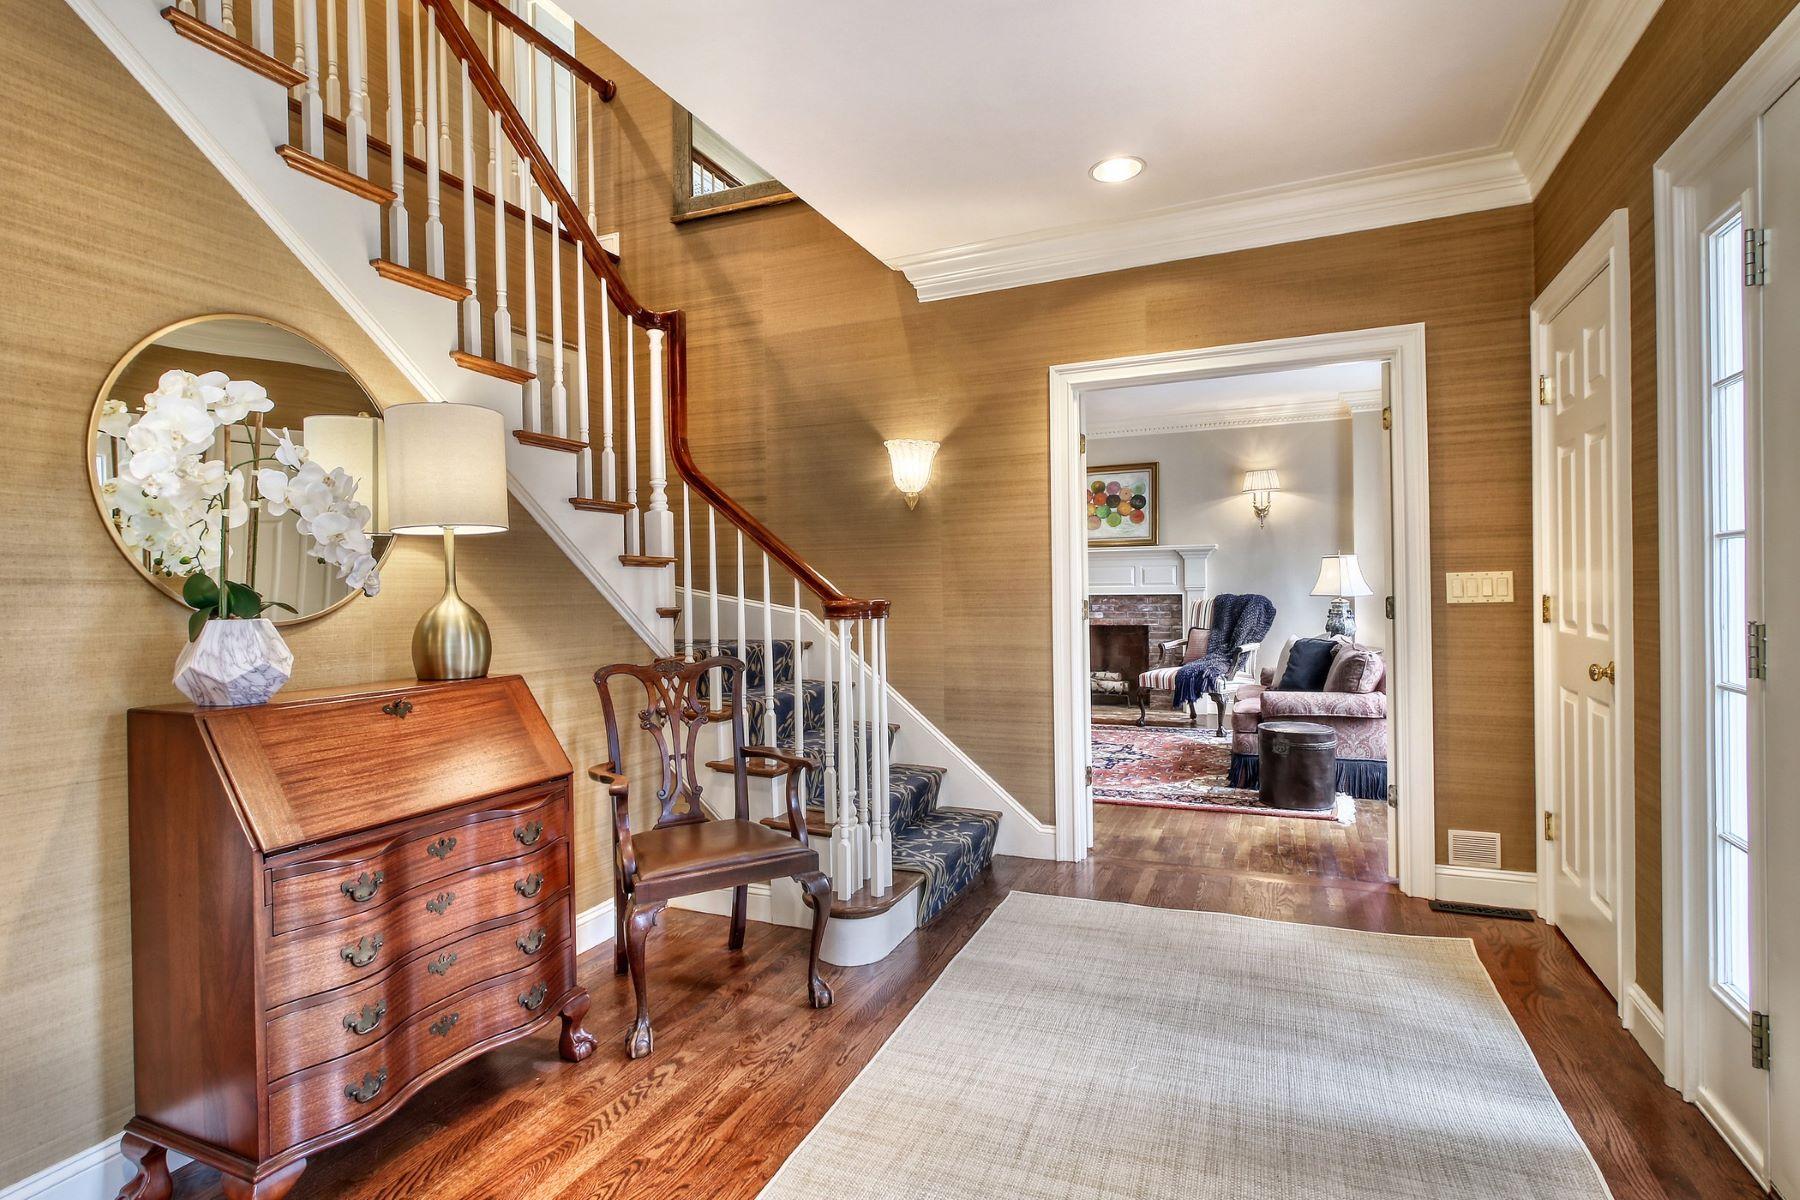 Single Family Homes for Sale at 8 Carmel Circle, Lexington 8 Carmel Cir Lexington, Massachusetts 02421 United States